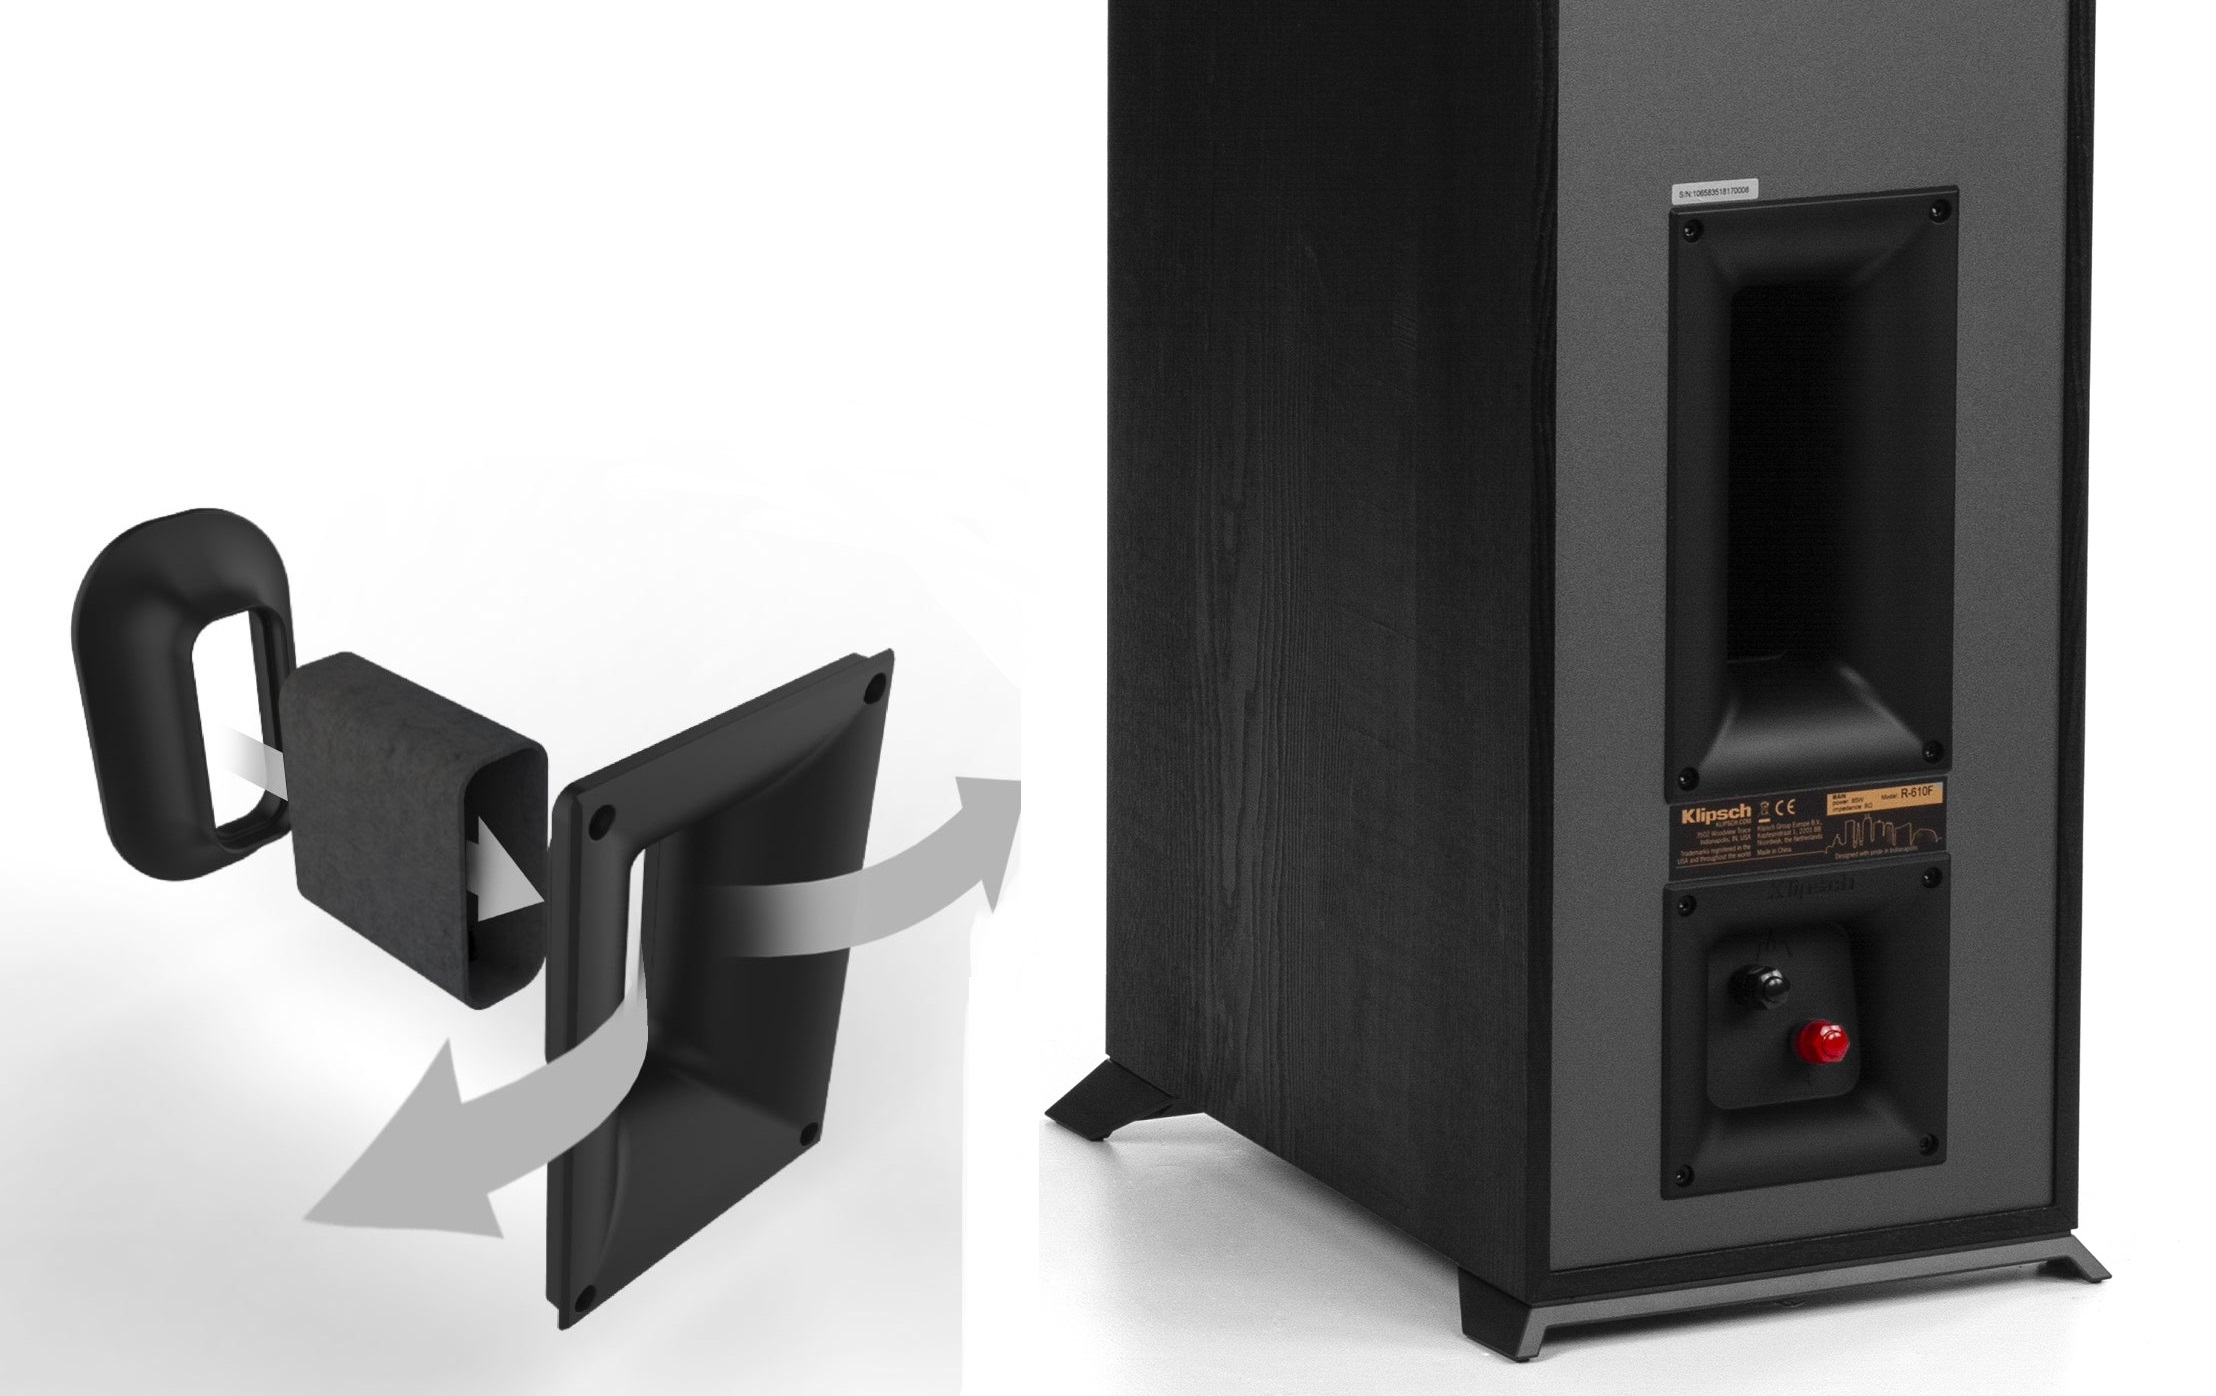 Loa Klipsch R-610F | HAYAUDIO.COM